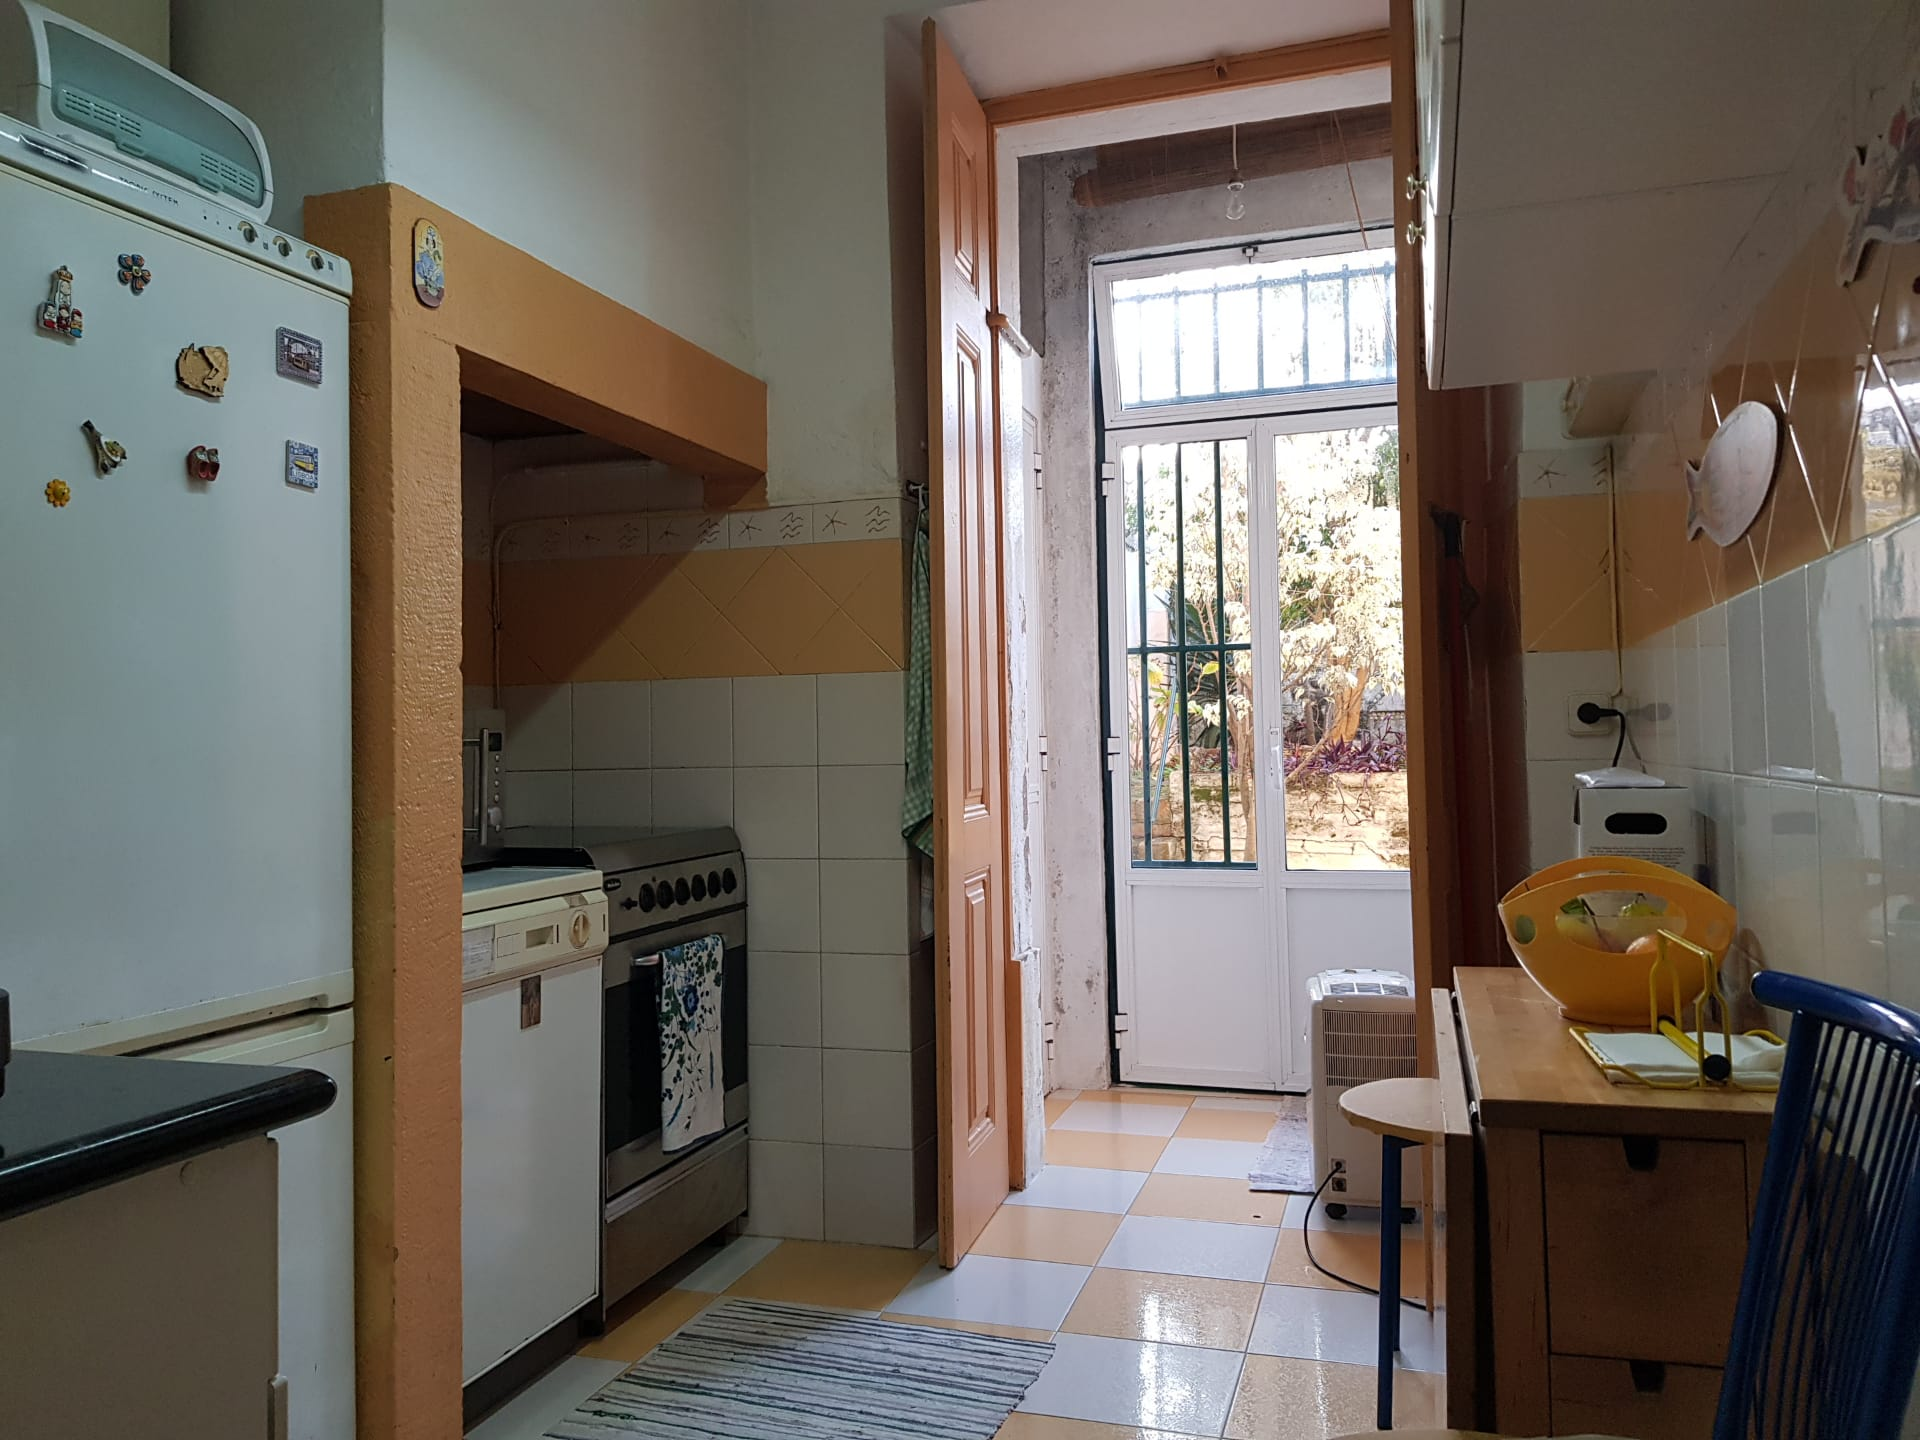 Apartment T2 +2 next to Saldanha with Patio